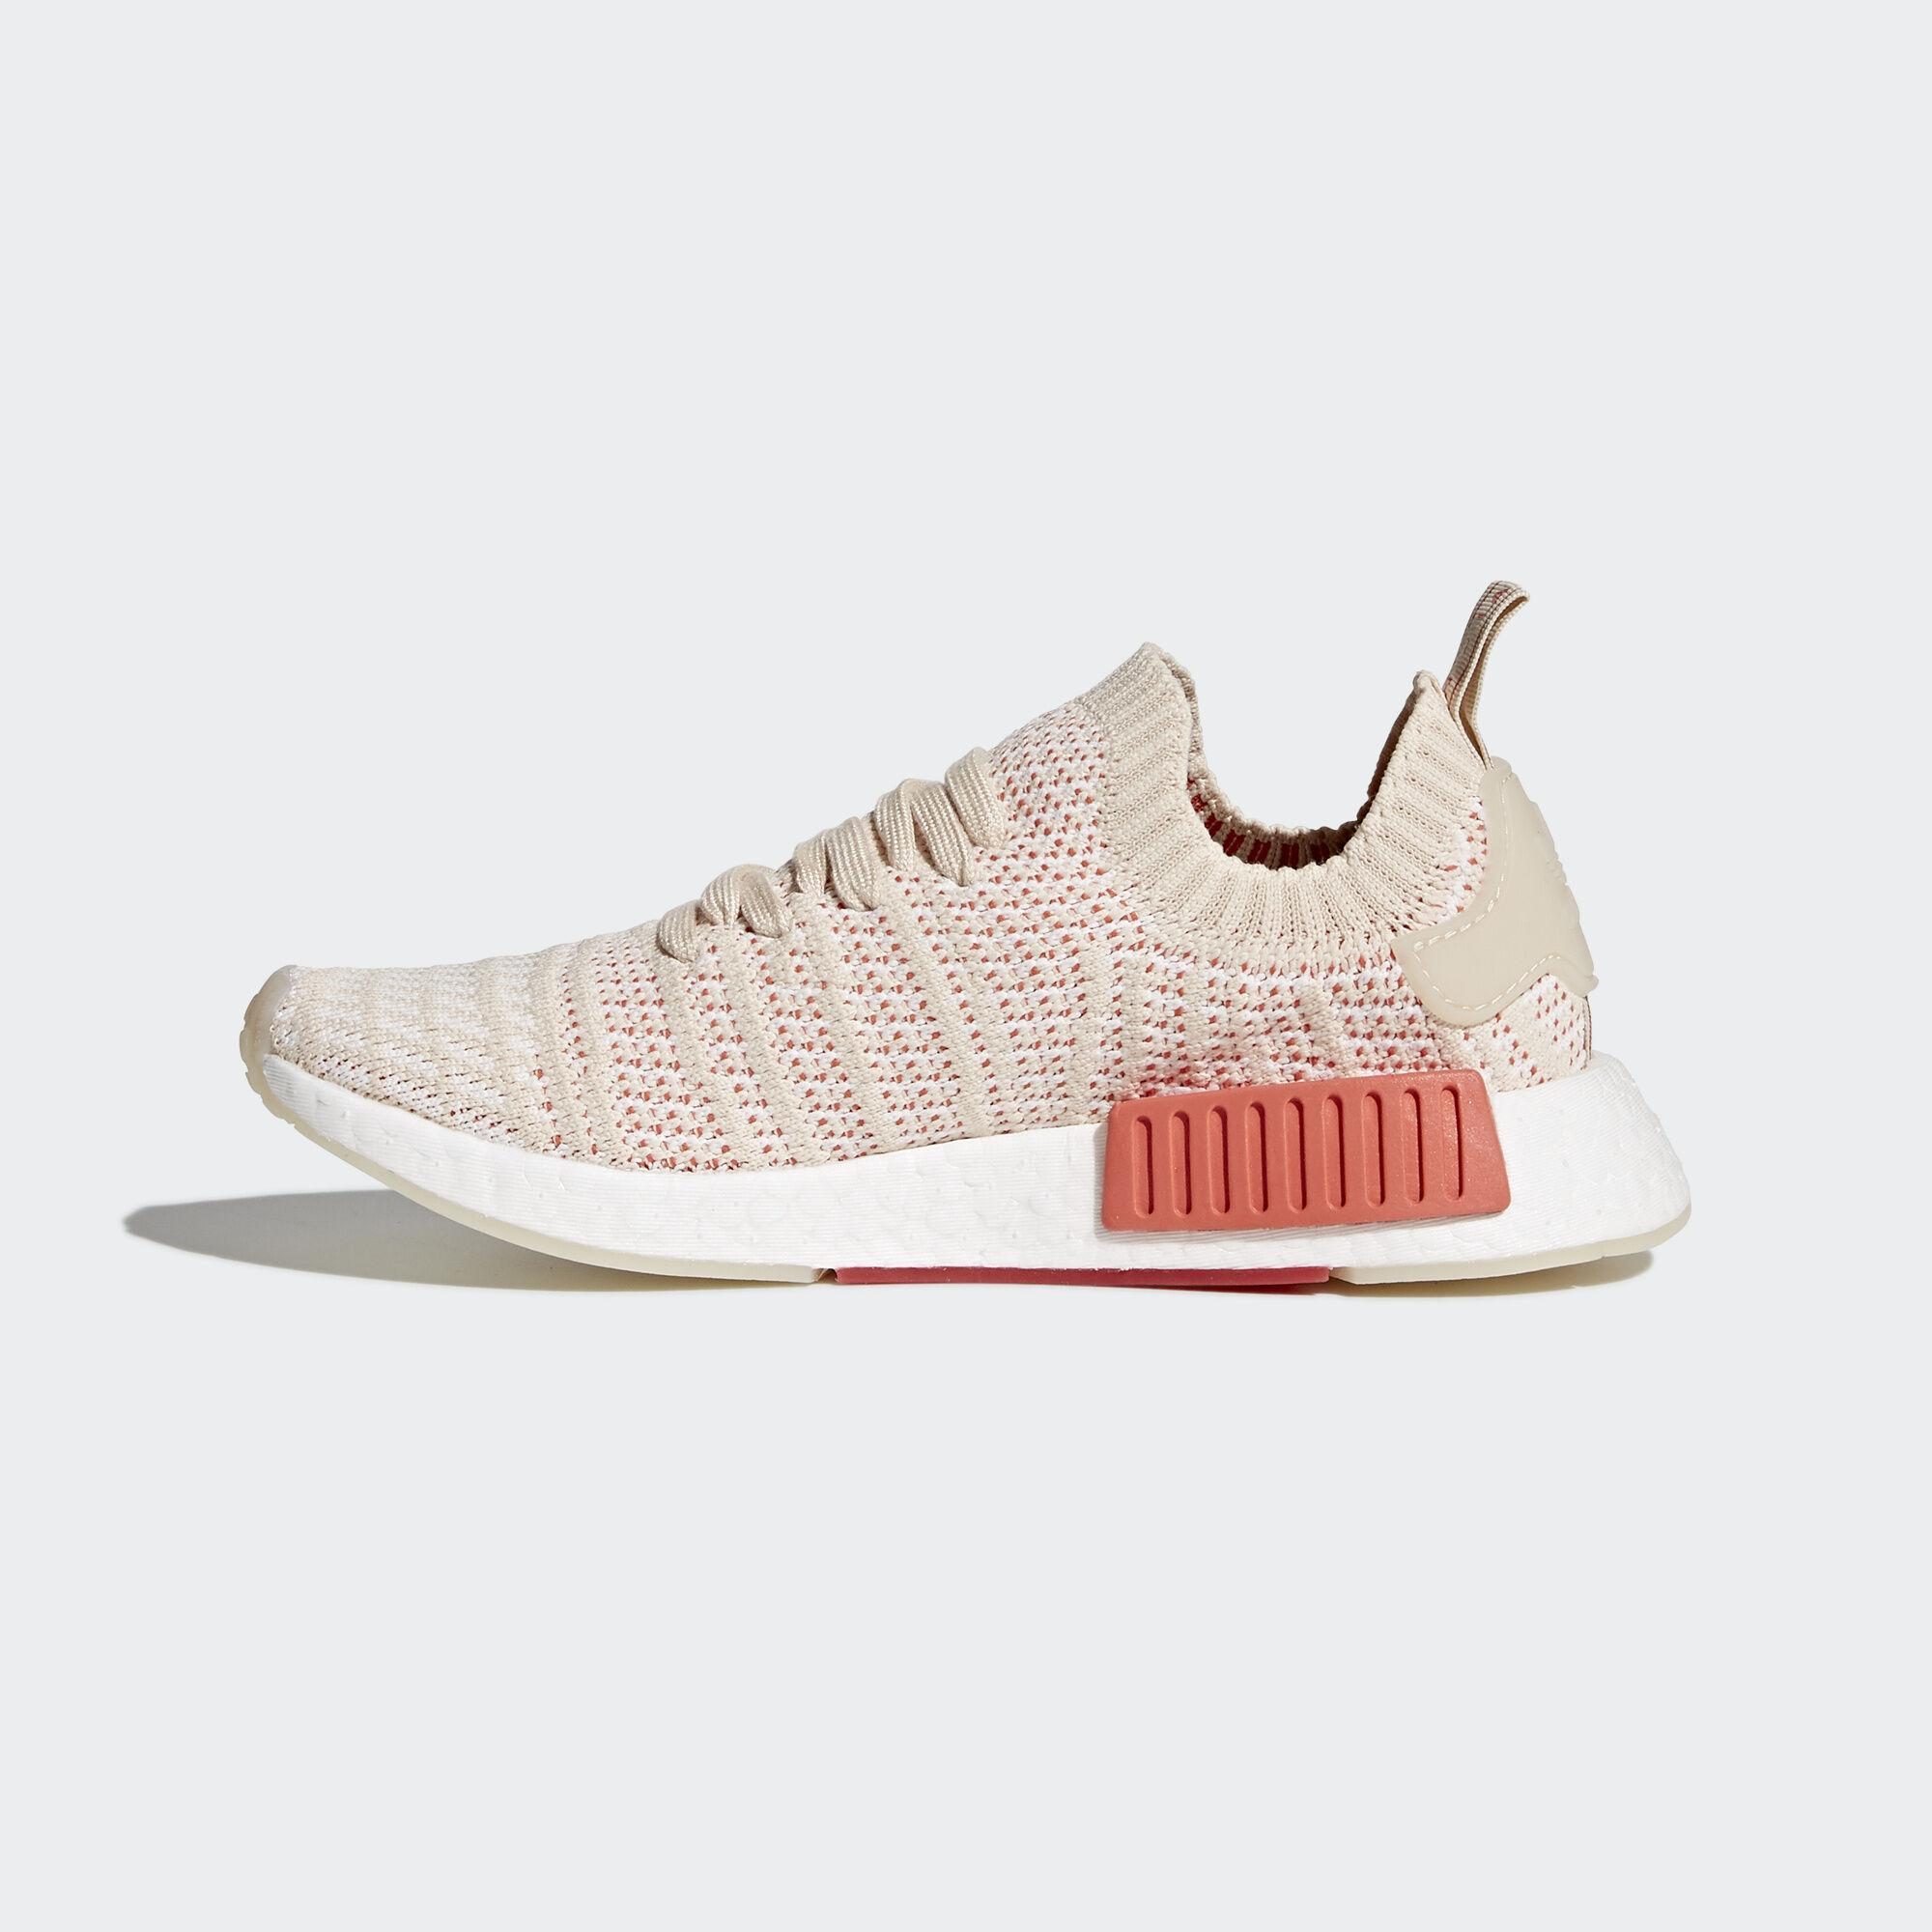 adidas-NMD-R1-STLT-Primeknit-Shoes-Women-039-s